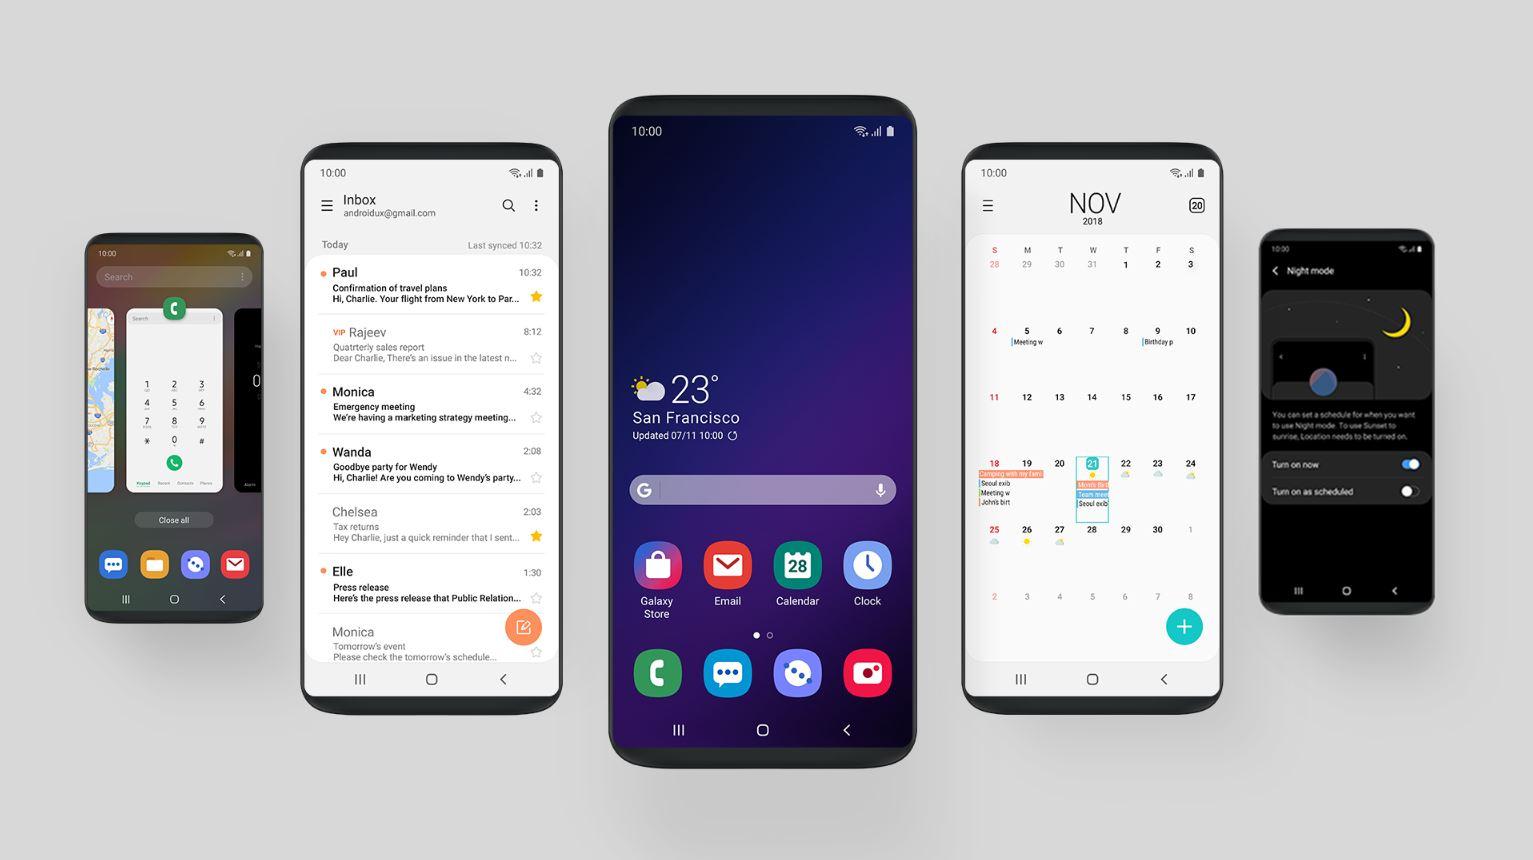 Samsung уже тестирует оболочку One UI 3.1.1: её выпустят для Galaxy S21, Galaxy S21 и Galaxy S21 Ultra в конце августа